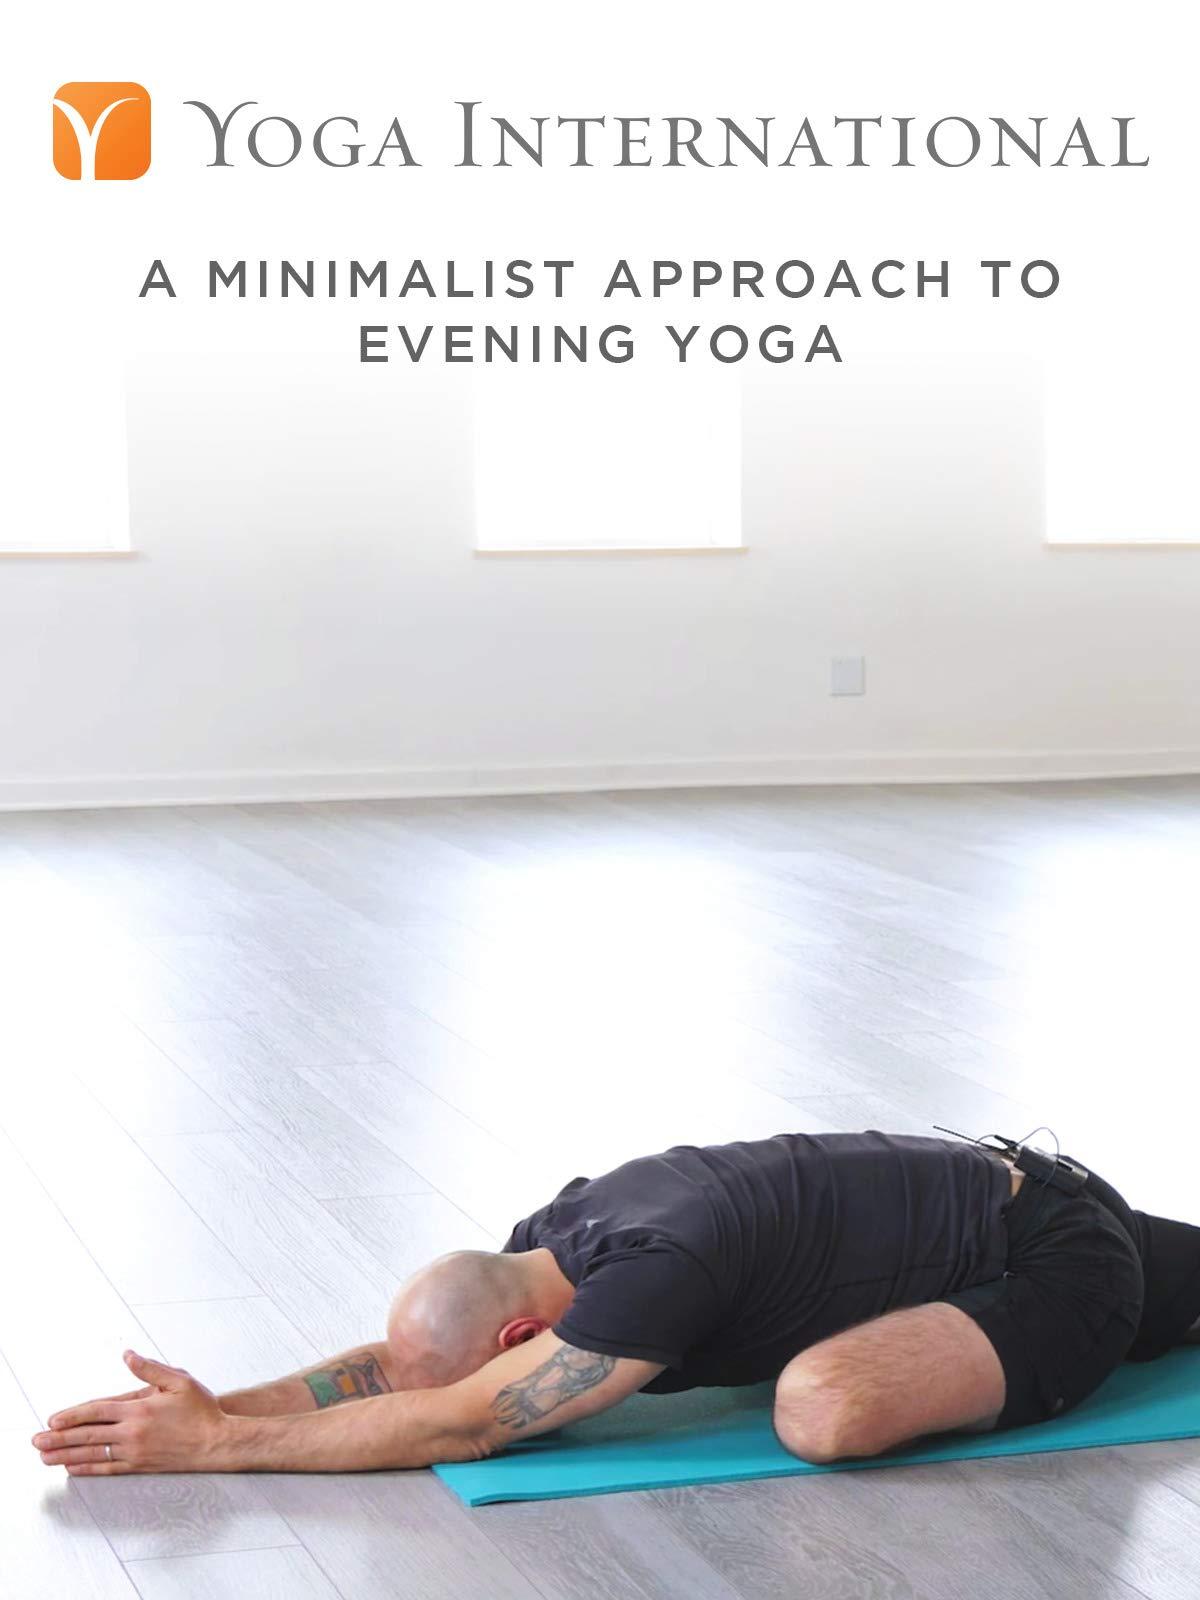 A Minimalist Approach to Evening Yoga